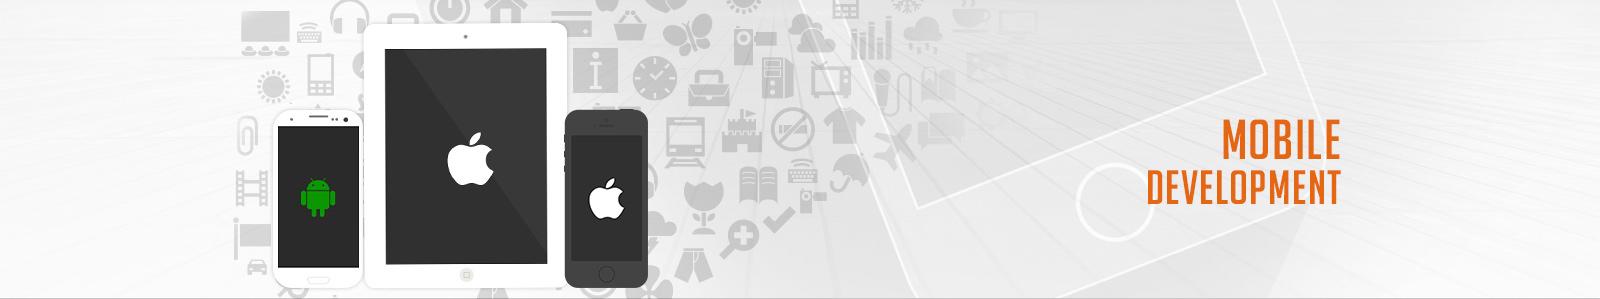 Logistic Infotech - Mobile Application Development Company